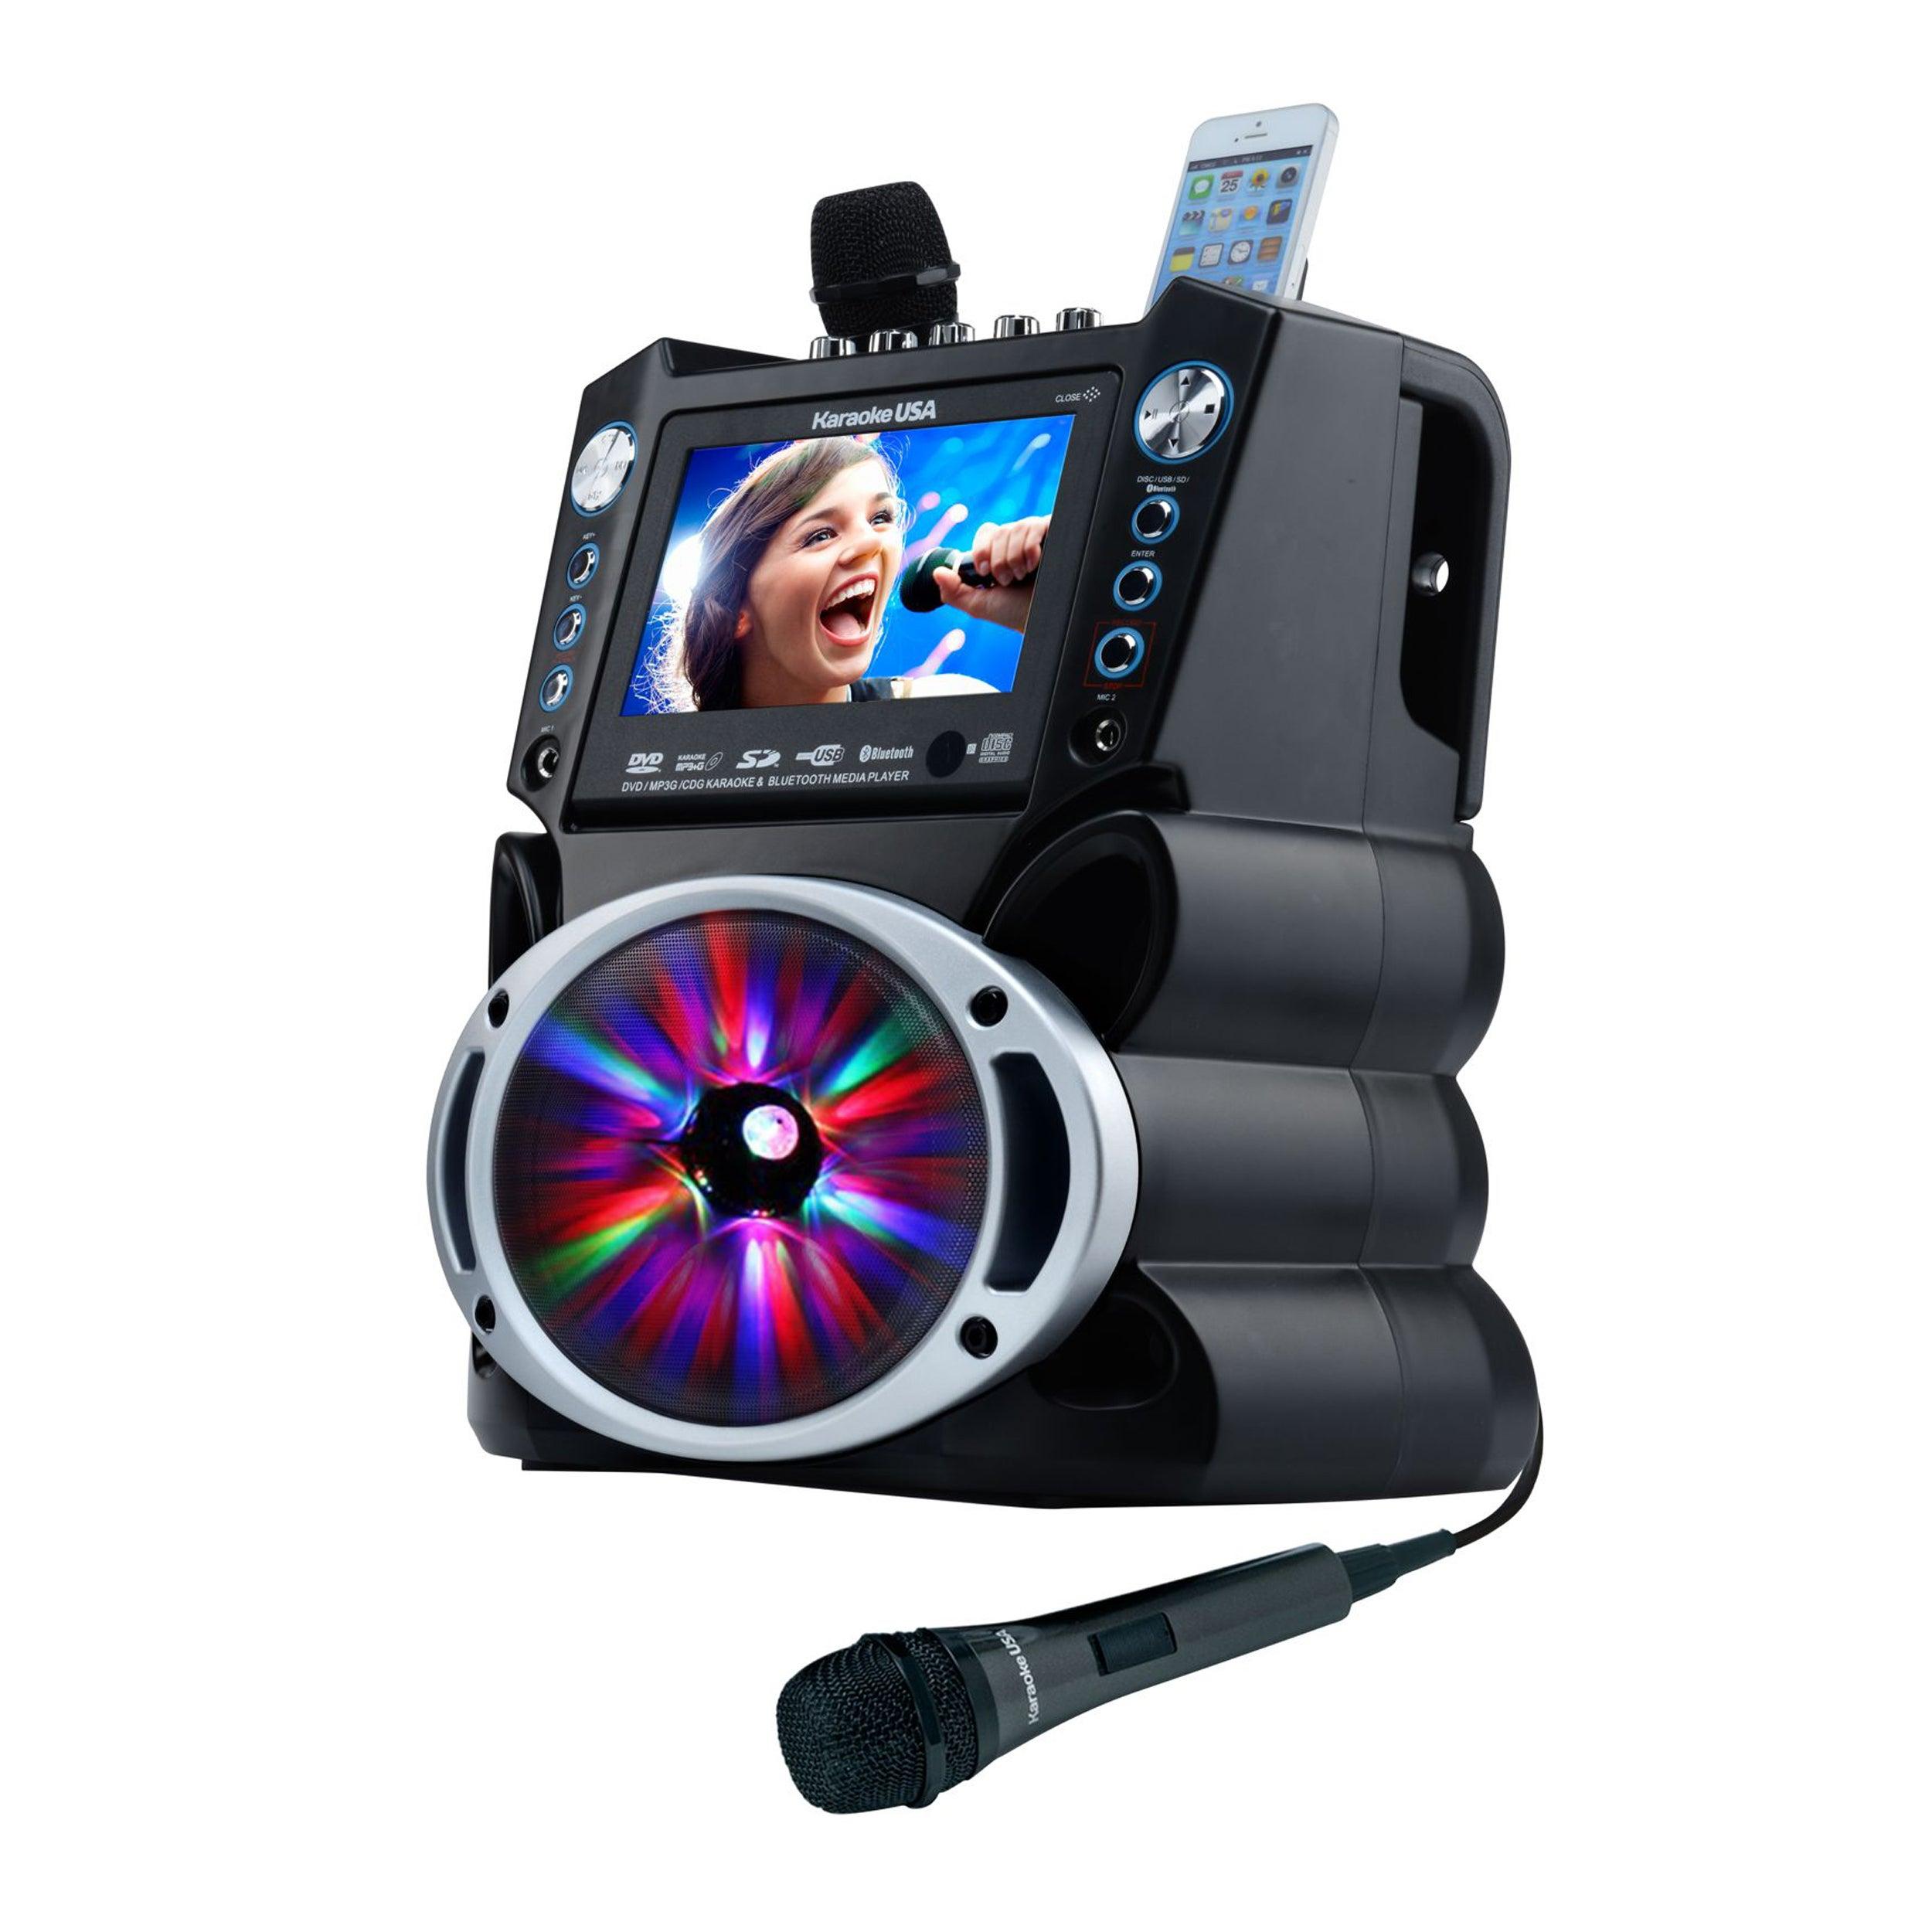 DOK GF842 Karaoke System